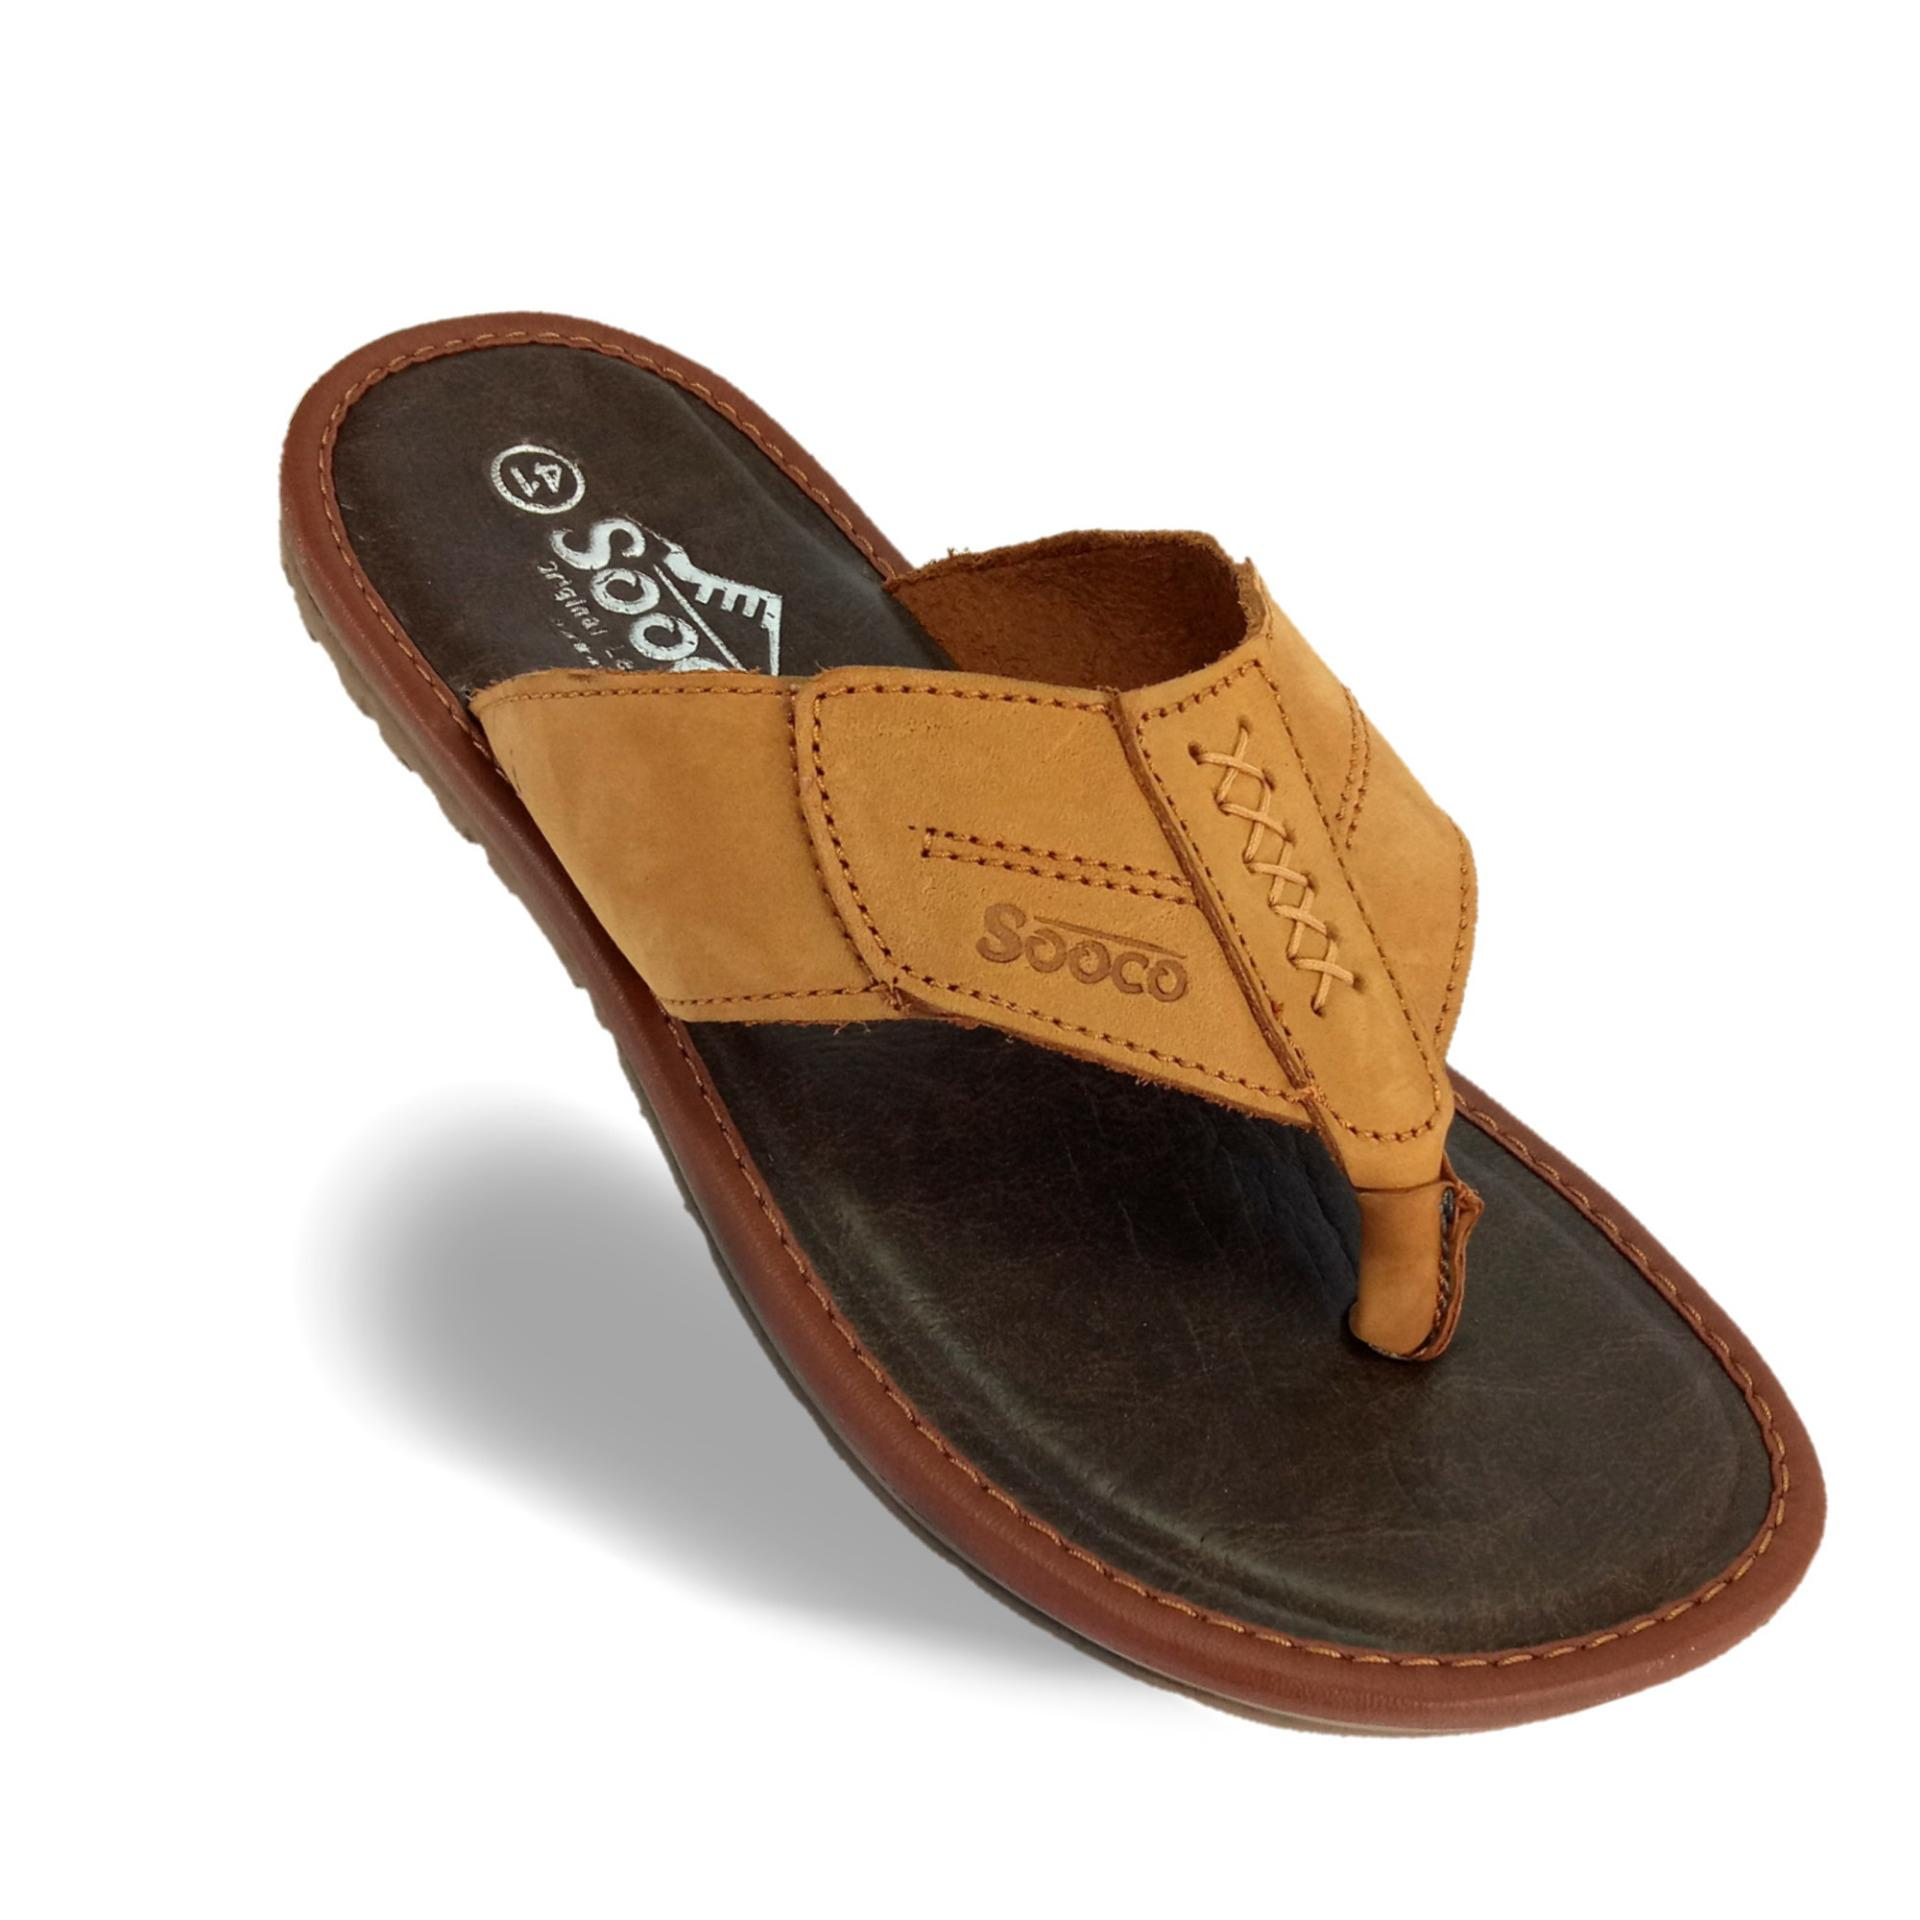 Spesifikasi Sandal Pria Kulit Asli Sooco